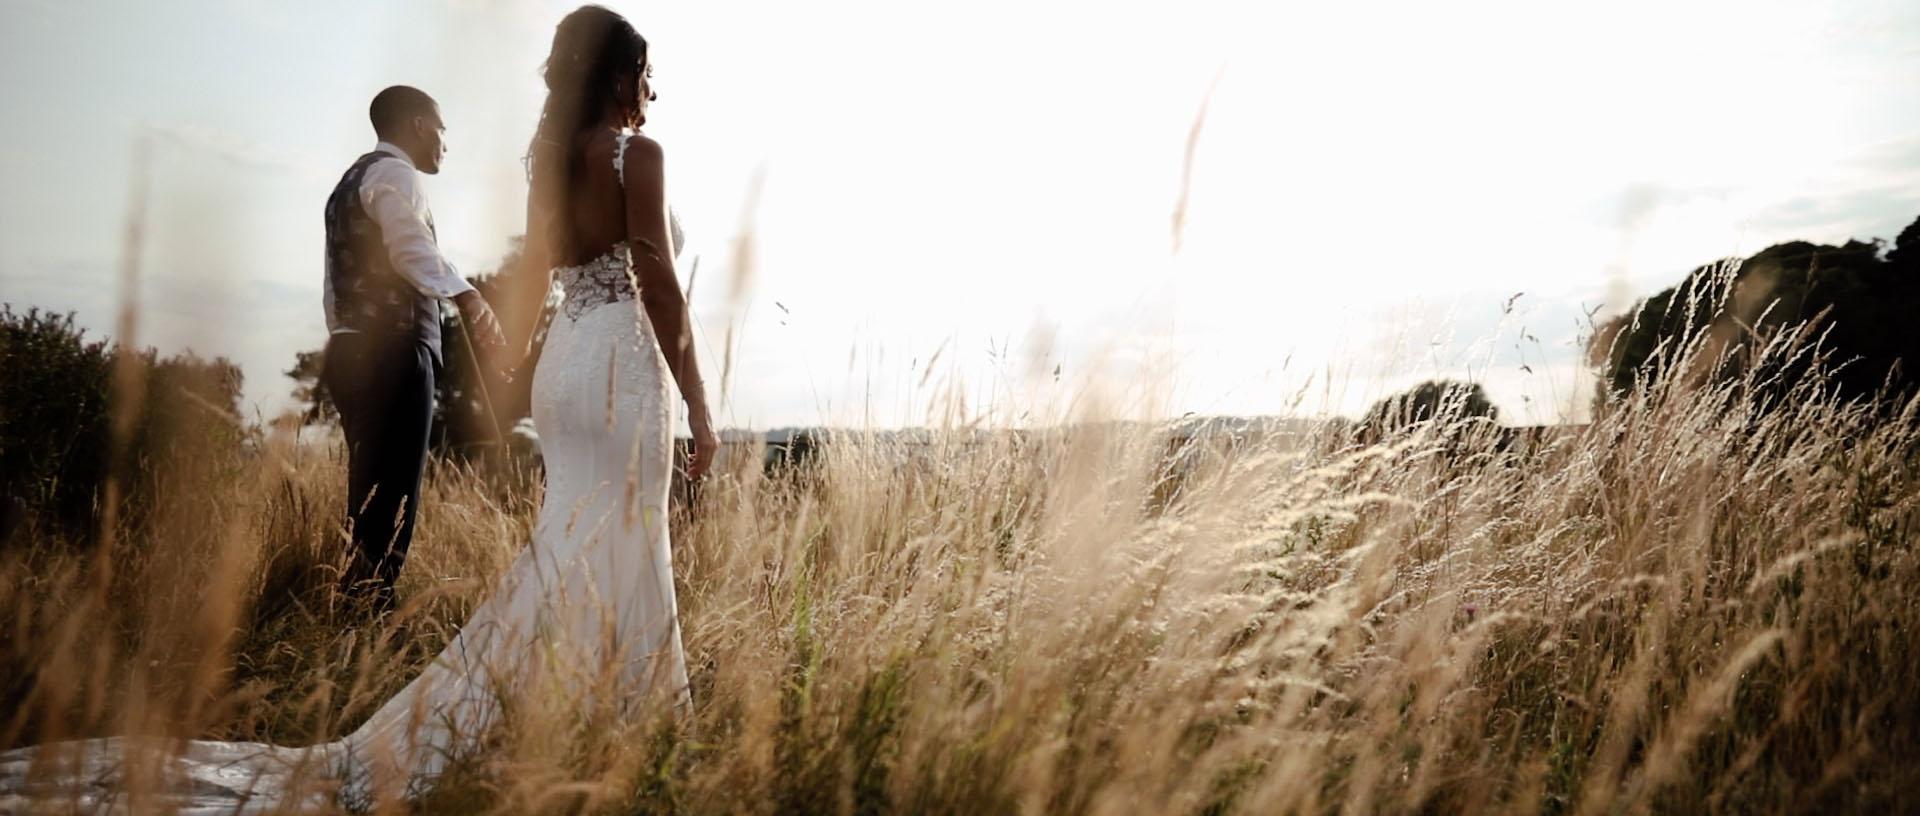 Hyde Barn Colswolds Wedding Verity-Jade & Kai Cropped B.jpg